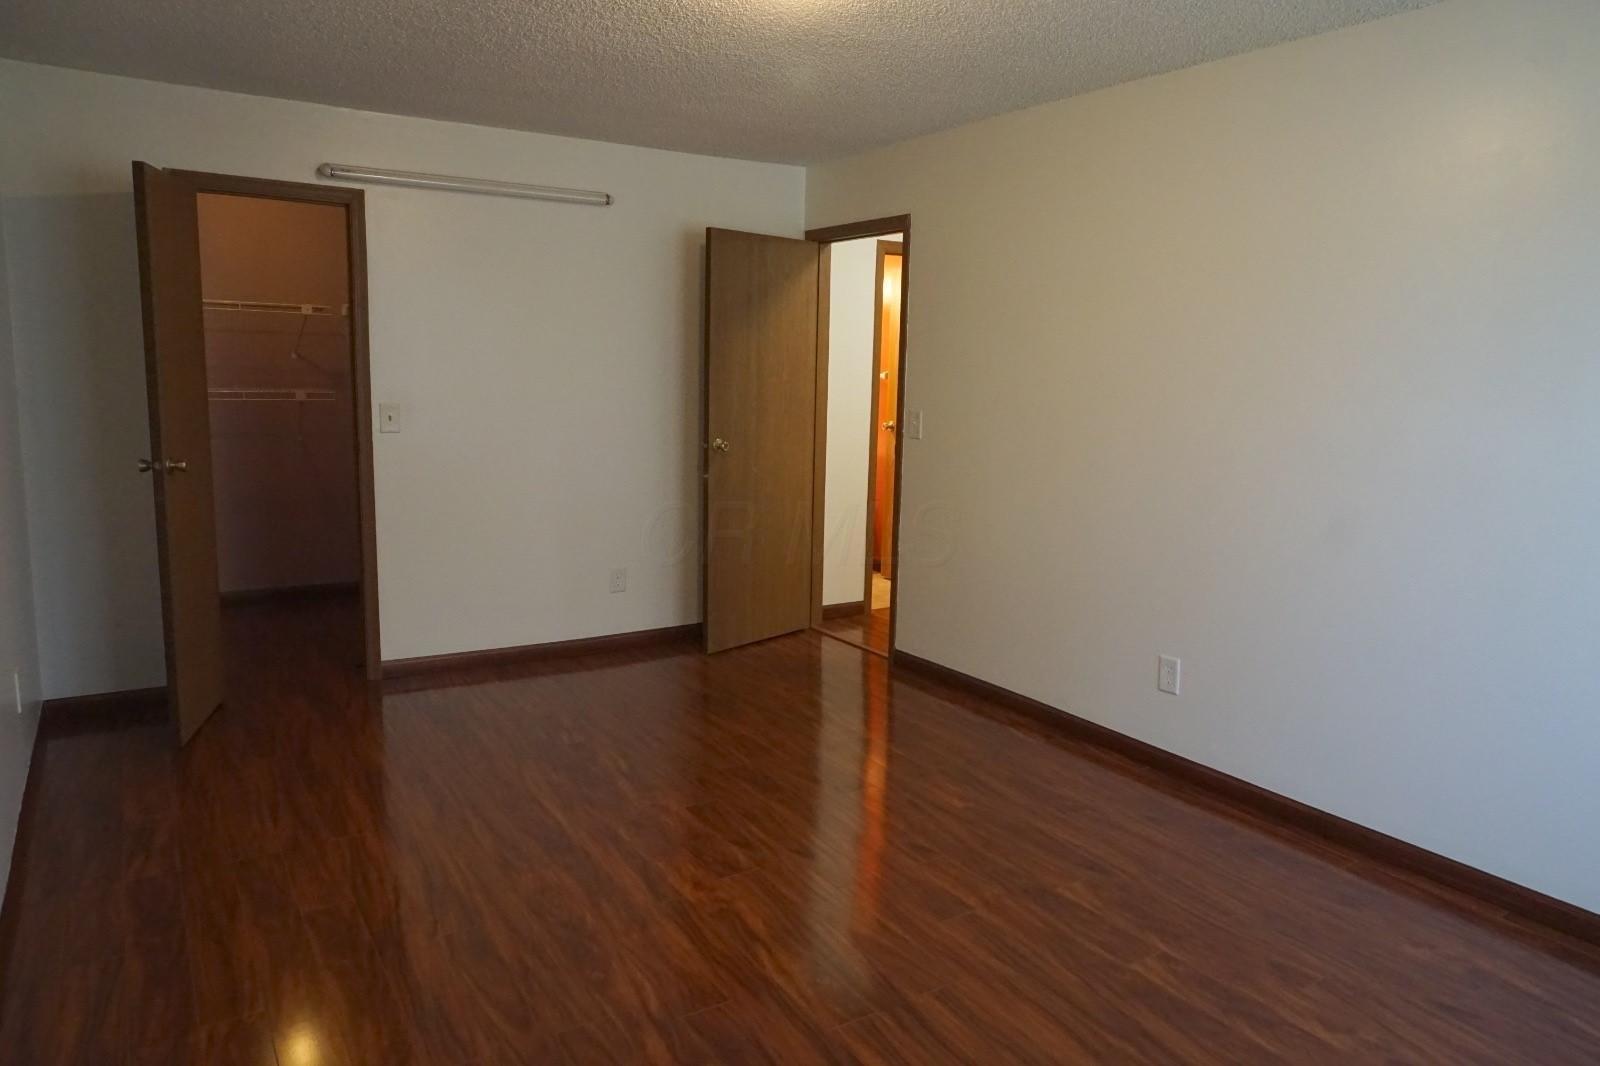 5027 Crockett Drive, Hilliard, Ohio 43026, 3 Bedrooms Bedrooms, ,3 BathroomsBathrooms,Residential,For Sale,Crockett,221000297